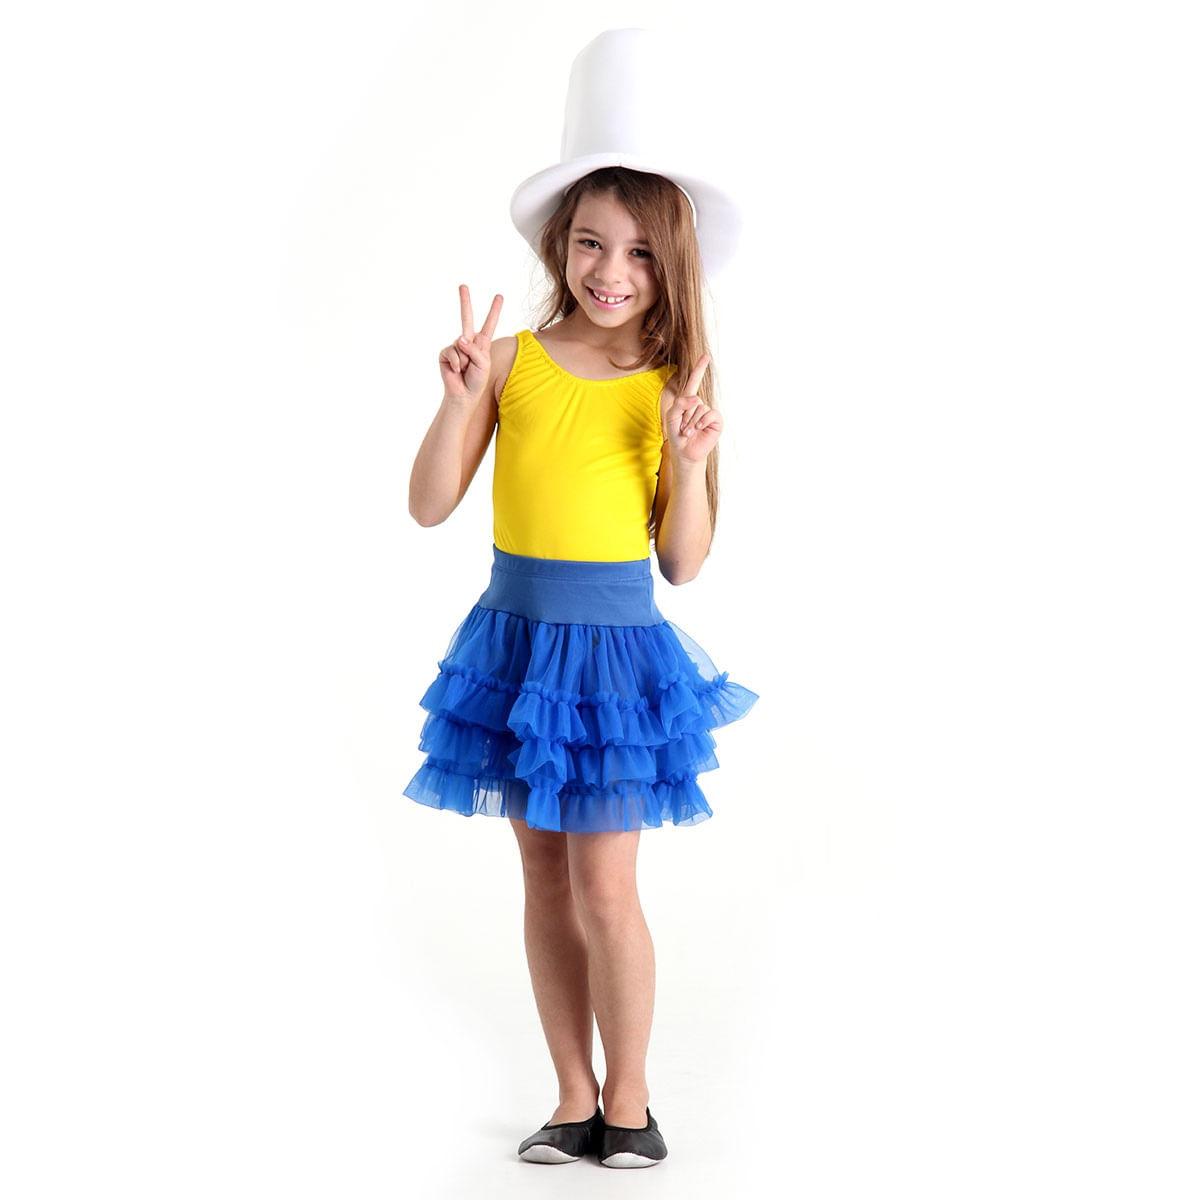 Fantasia Make Your Own - Saia Tutu Azul Infantil M